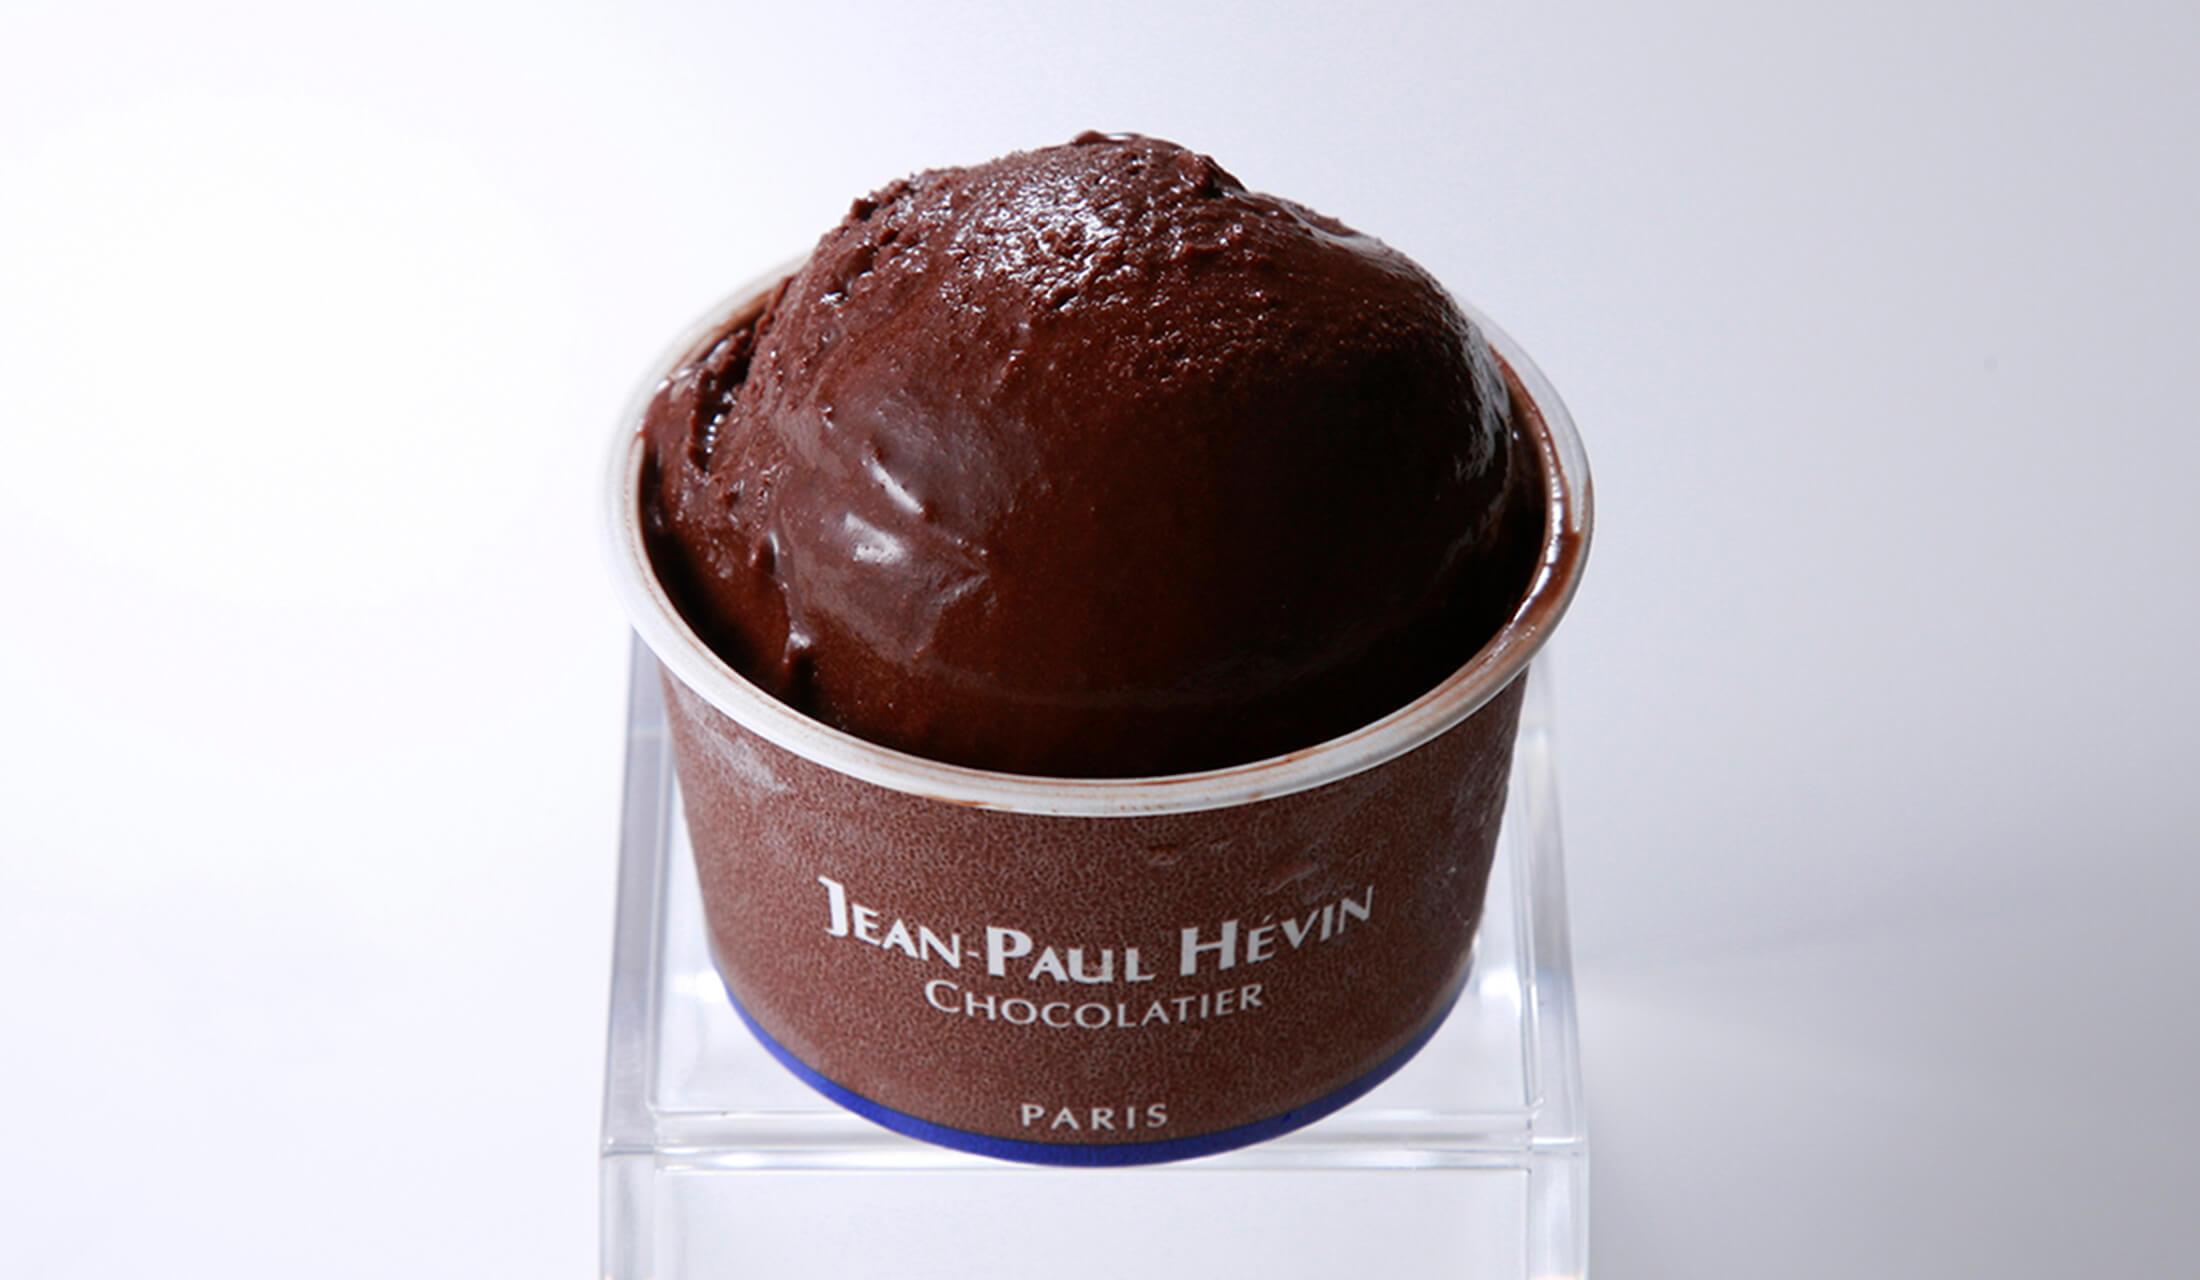 JEAN-PAUL HÉVIN(ジャン=ポール・エヴァン)のチョコレートアイスクリーム「グラス オ ショコラ」